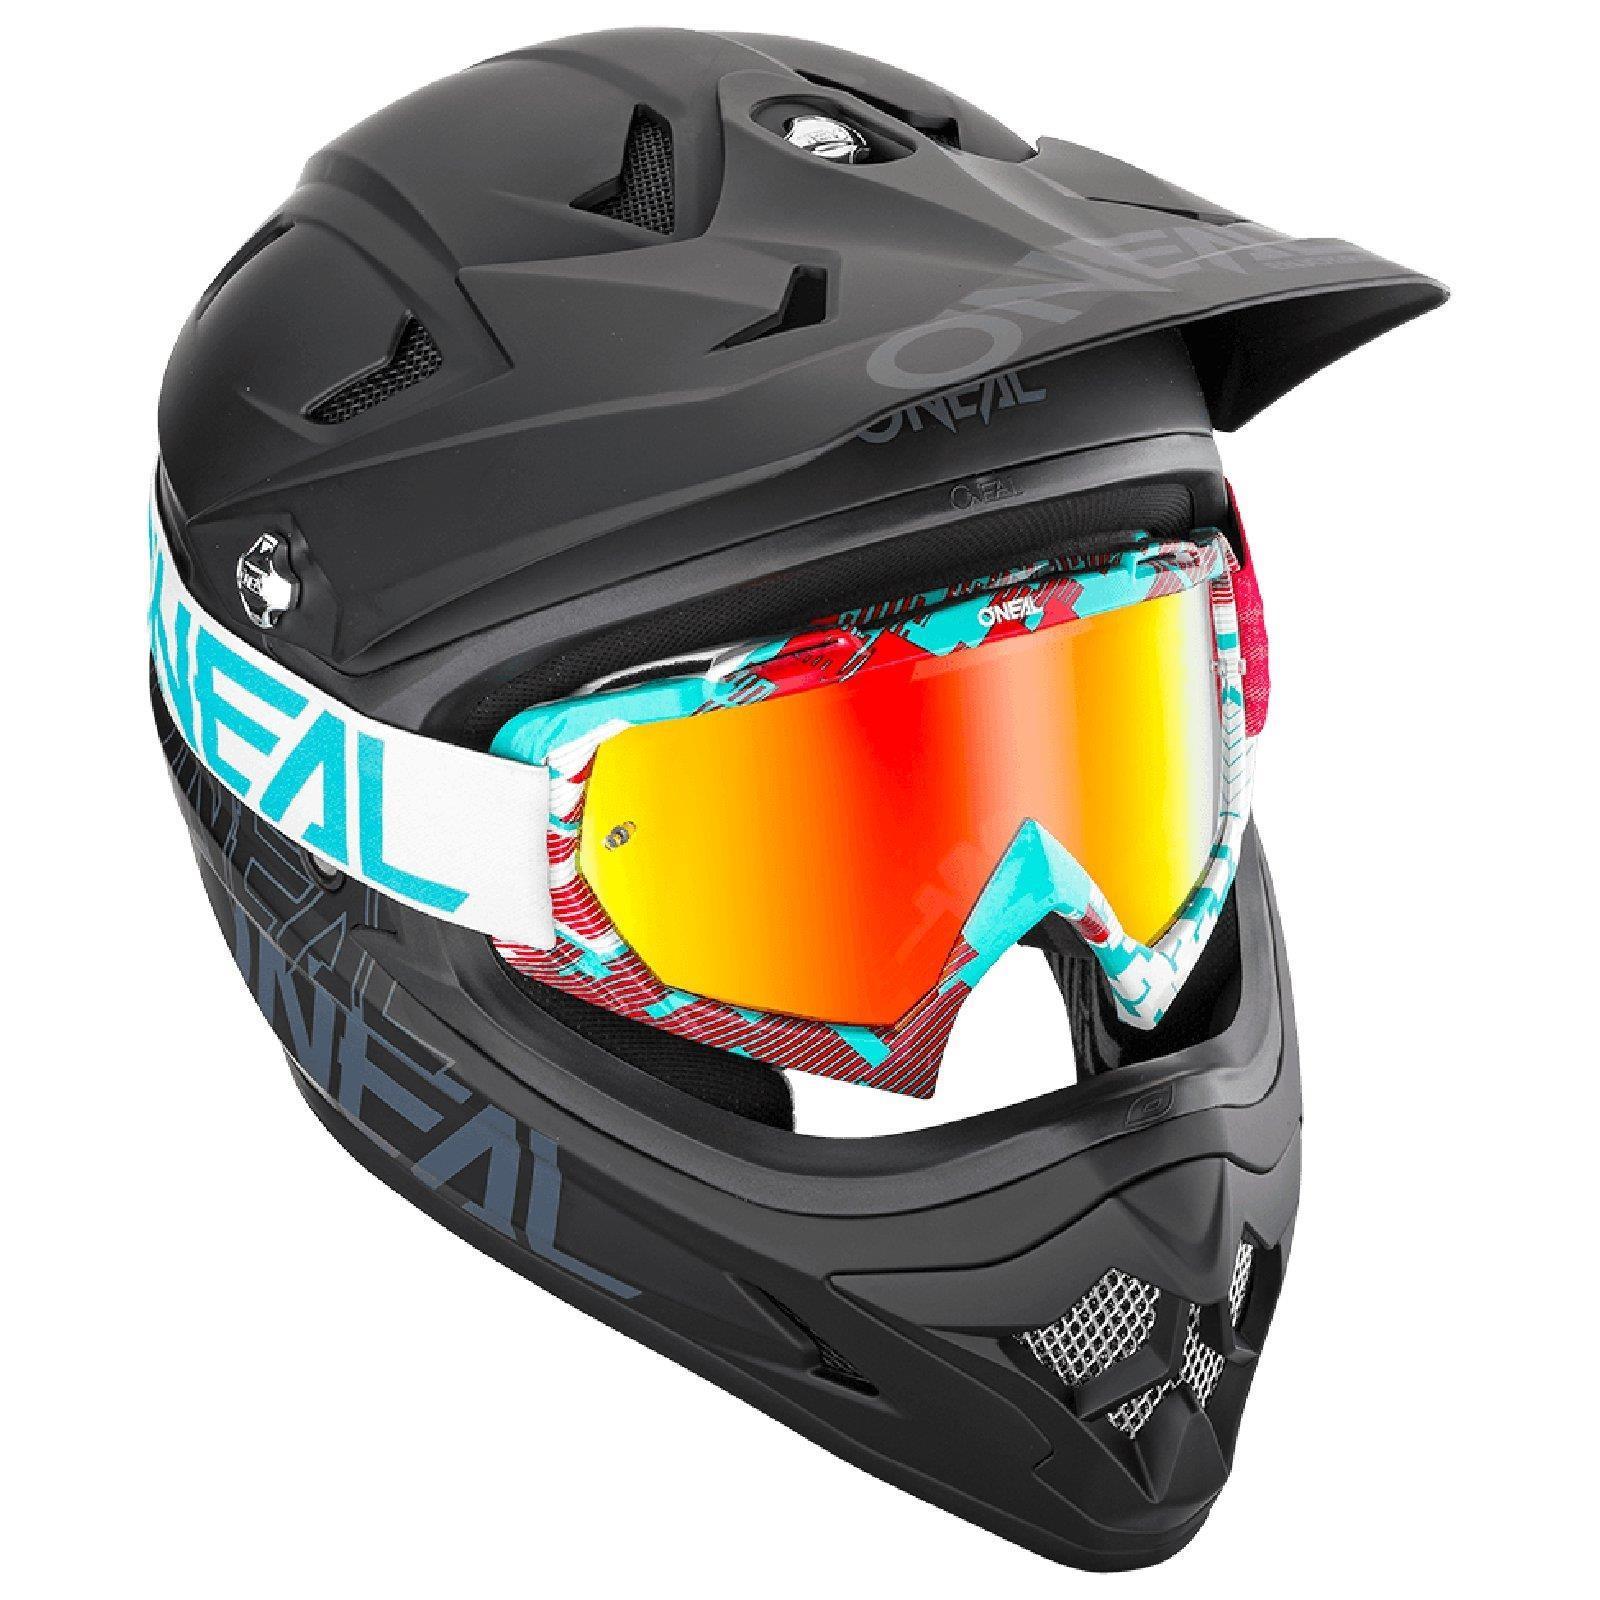 miniatuur 13 - O'Neal B-10 Goggle Pixel Radium Moto Cross Brille Downhill AntiFog Mountainbike